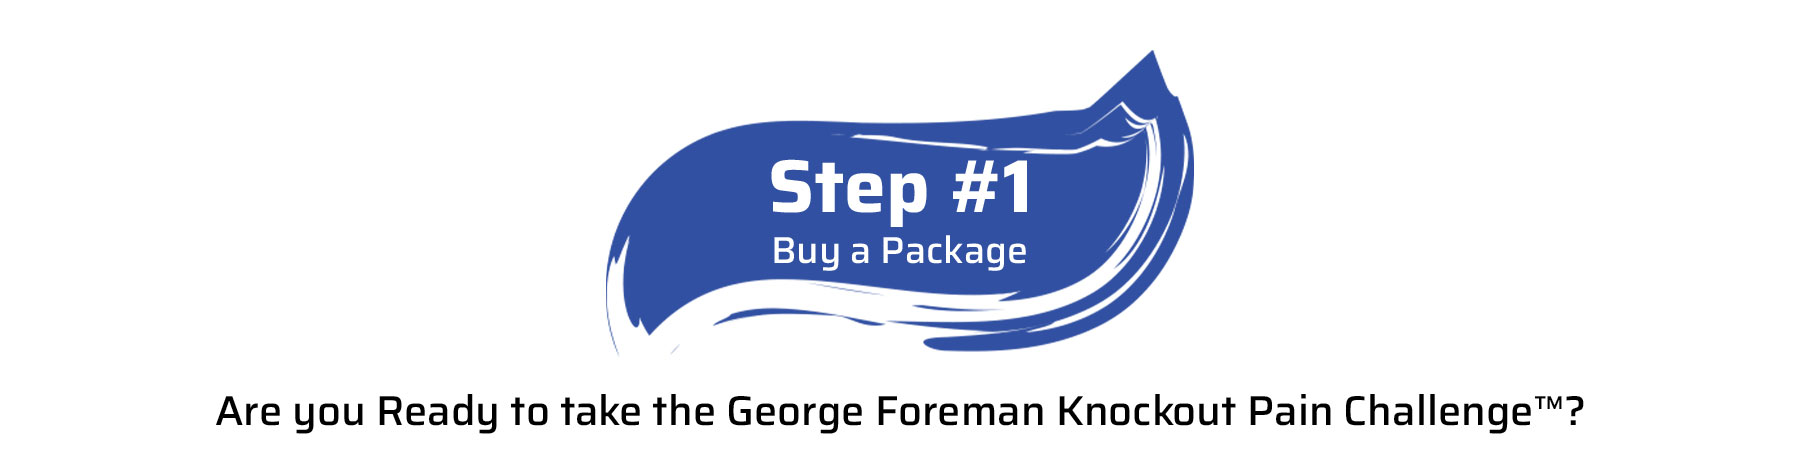 Step 1 - Buy a Package